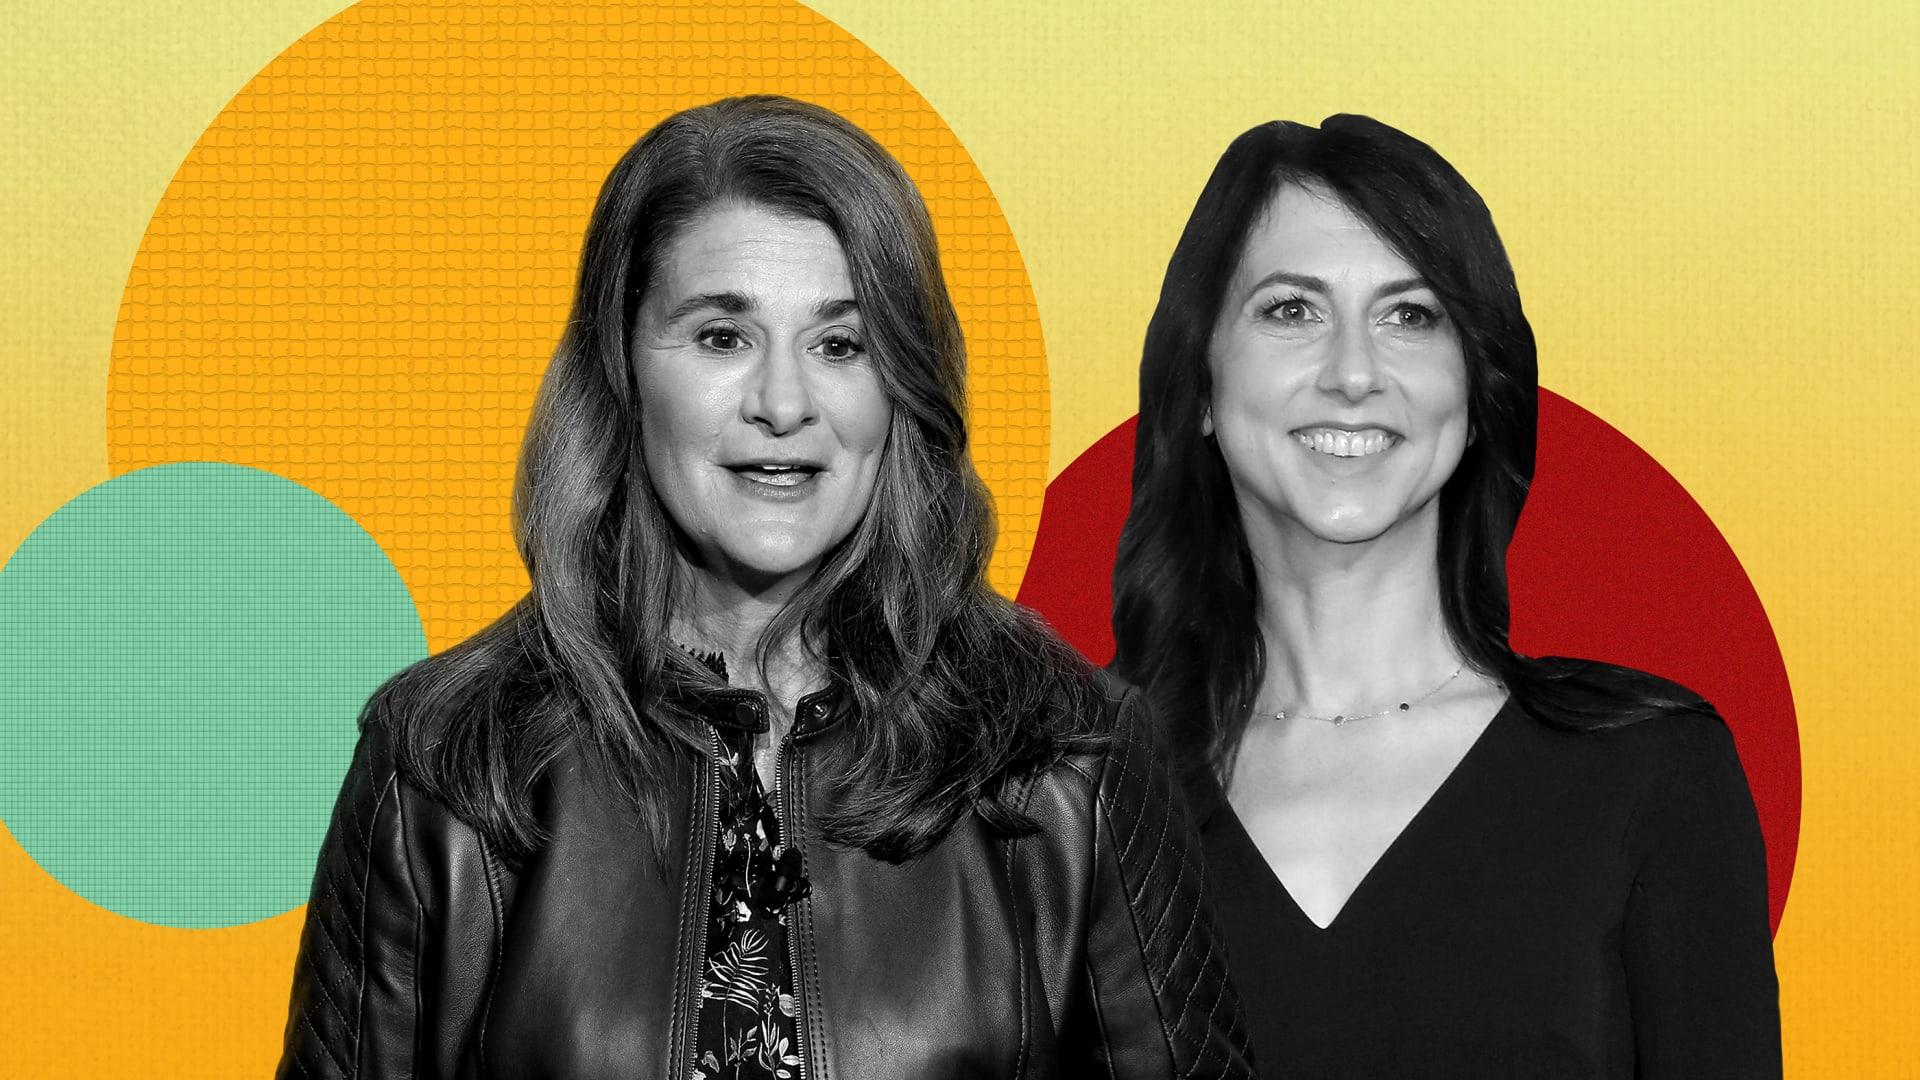 Pivotal Ventures founder Melinda Gates